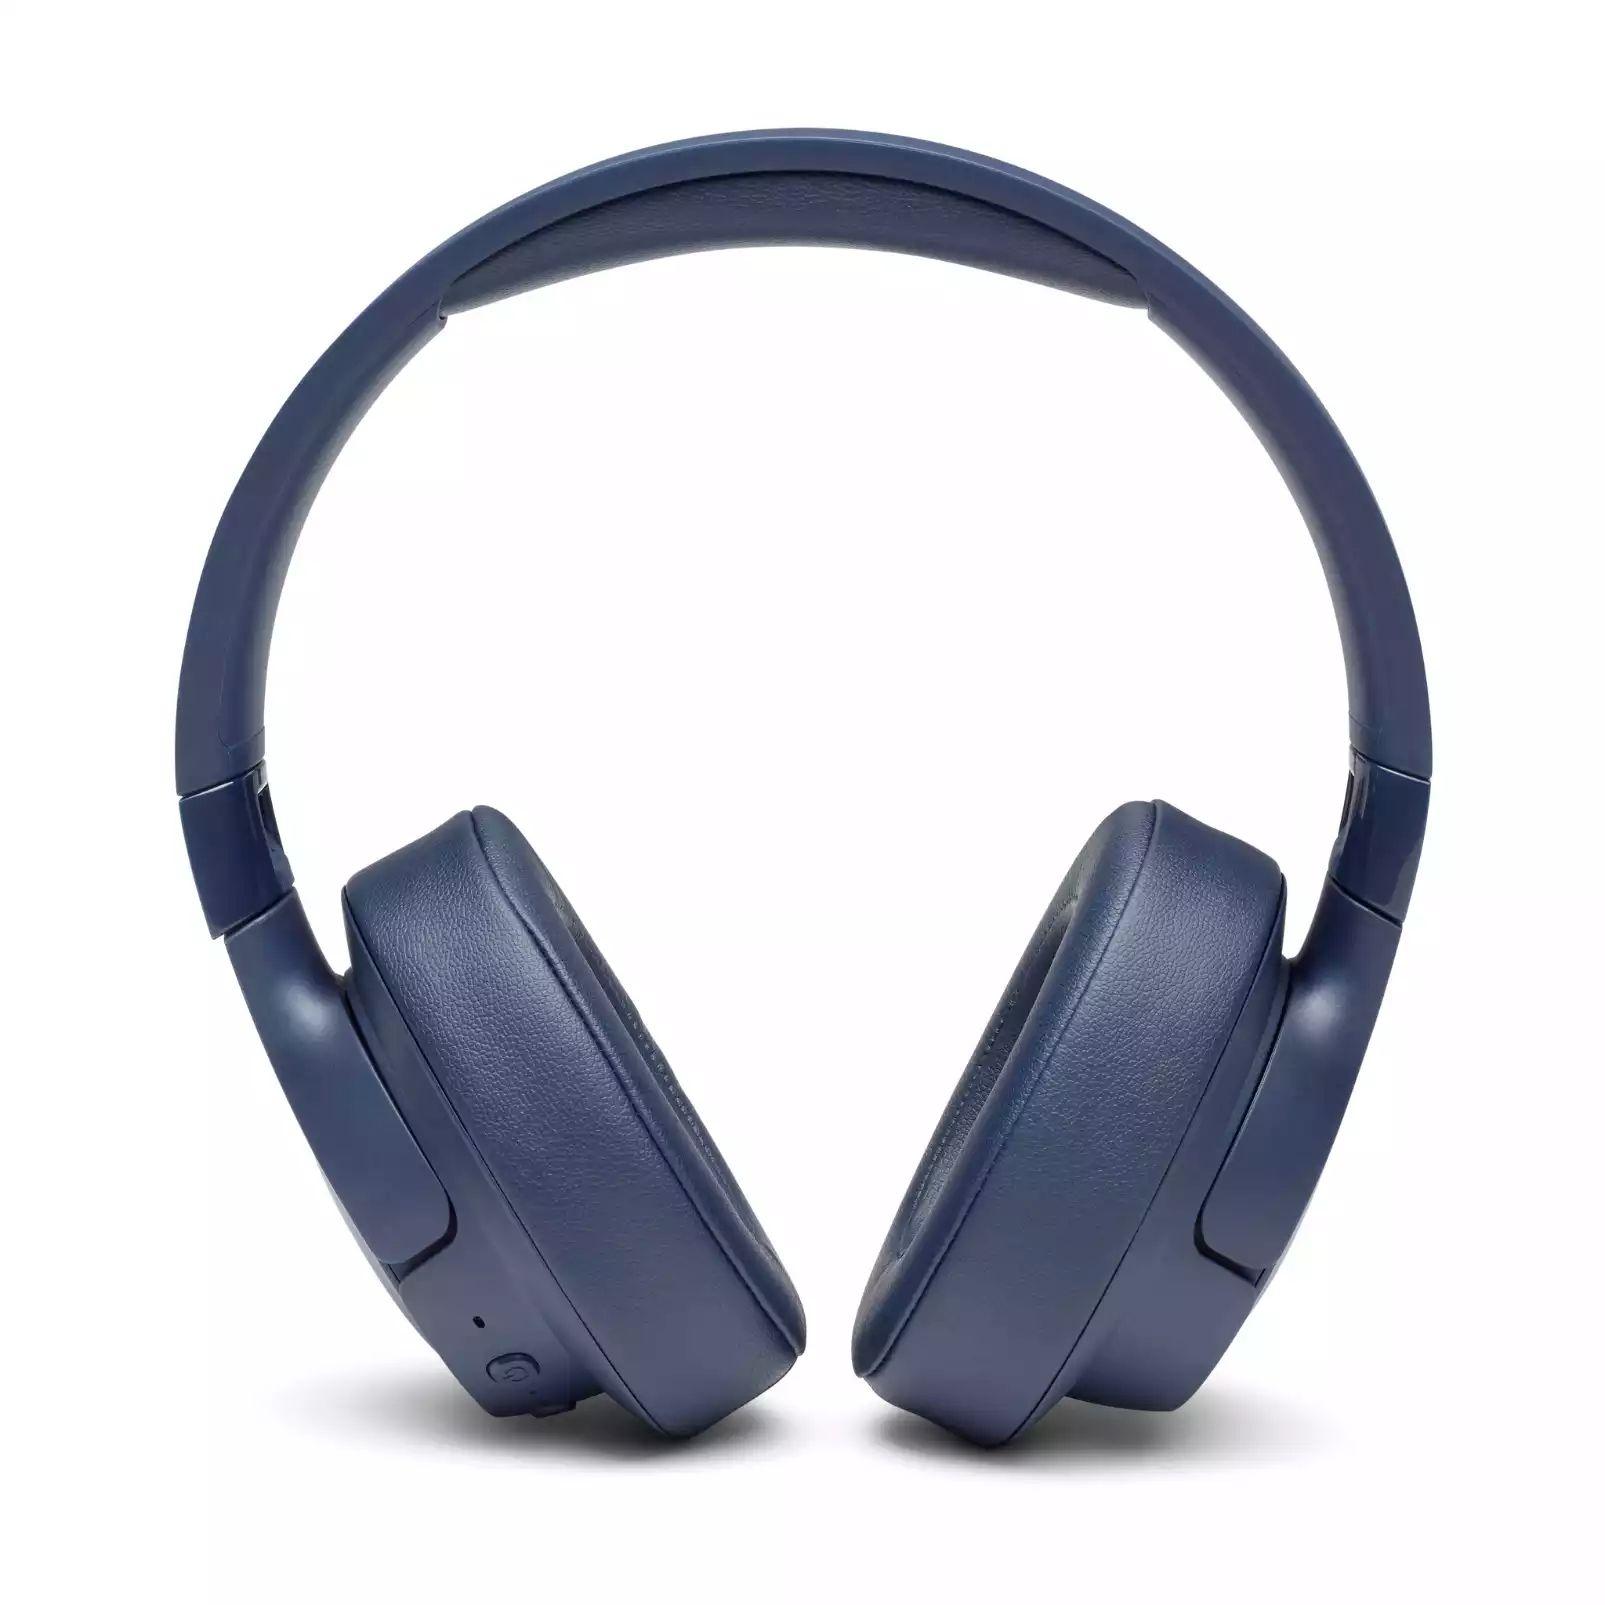 Fone de Ouvido Bluetooth JBL Tune 750BTNC - Azul JBLT750BTNCBLU